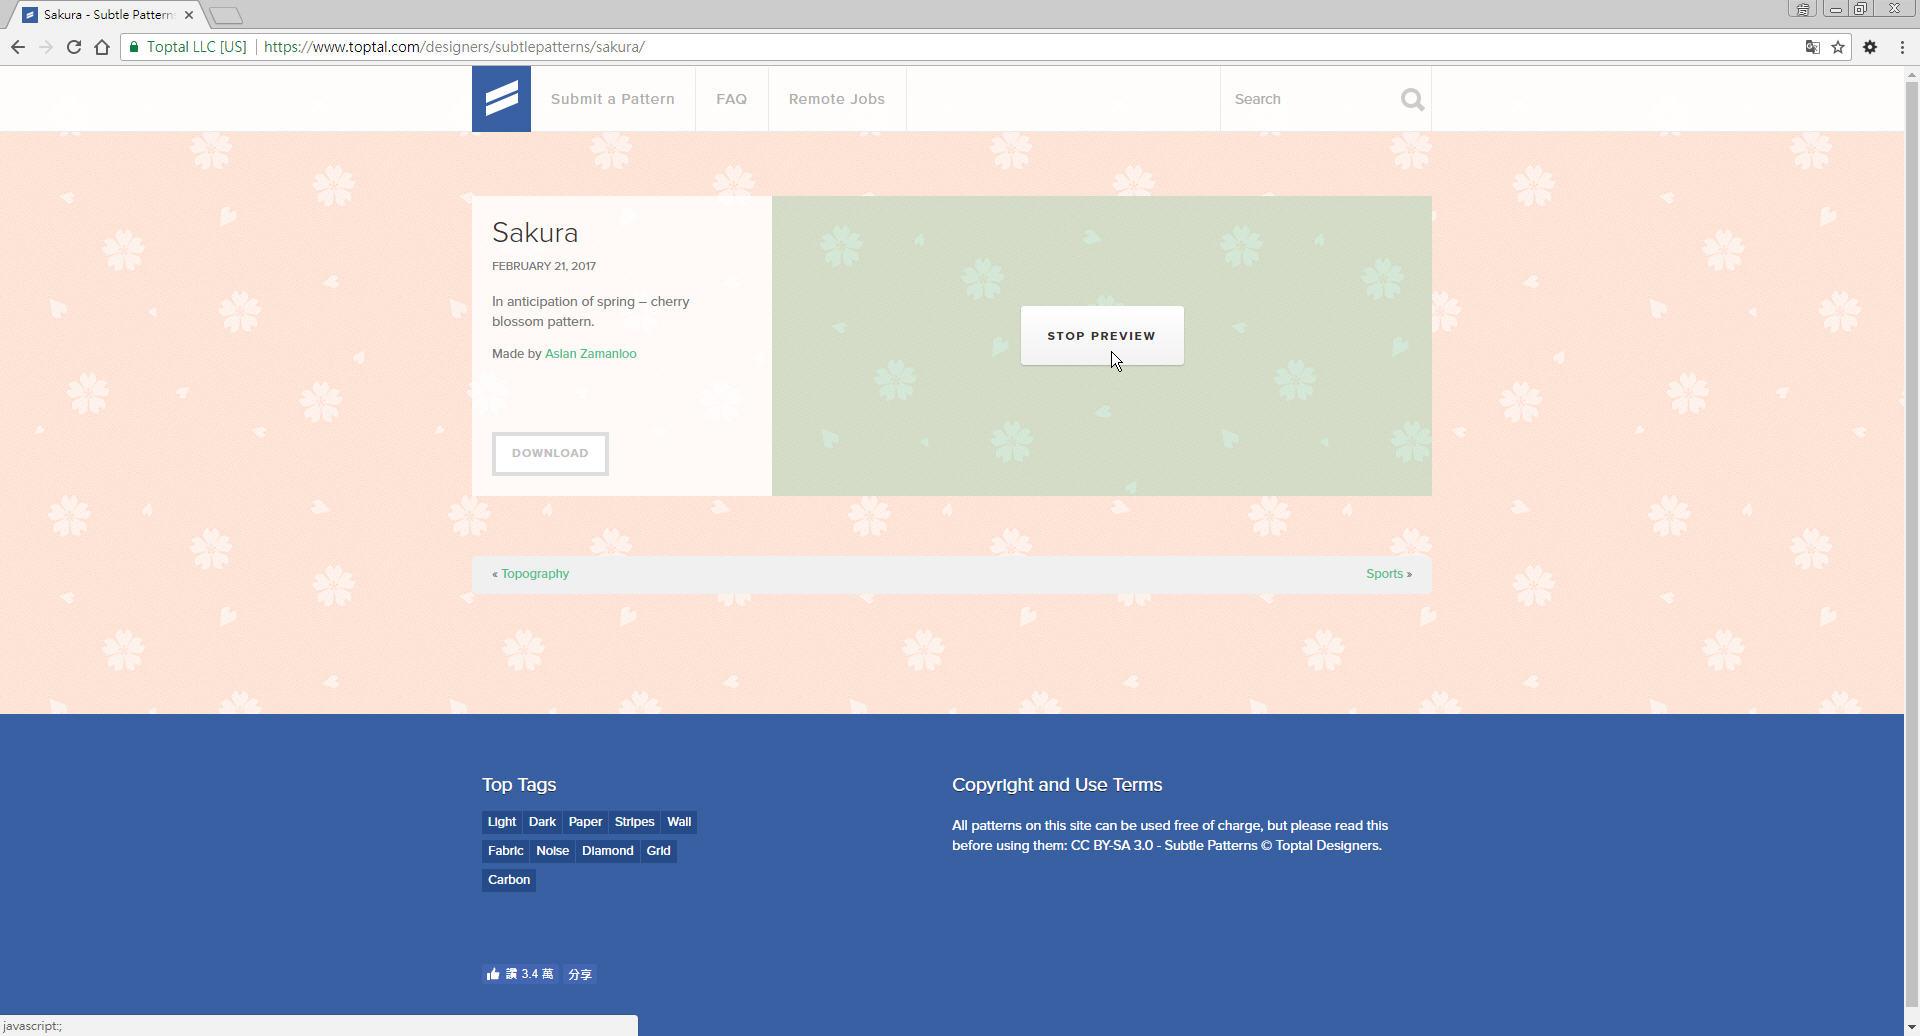 Free Resource 好康報報 Good Design 好站報報  - 【設計資源】Subtle Patterns - 免費下載之 pattern 素材網站 - p-7